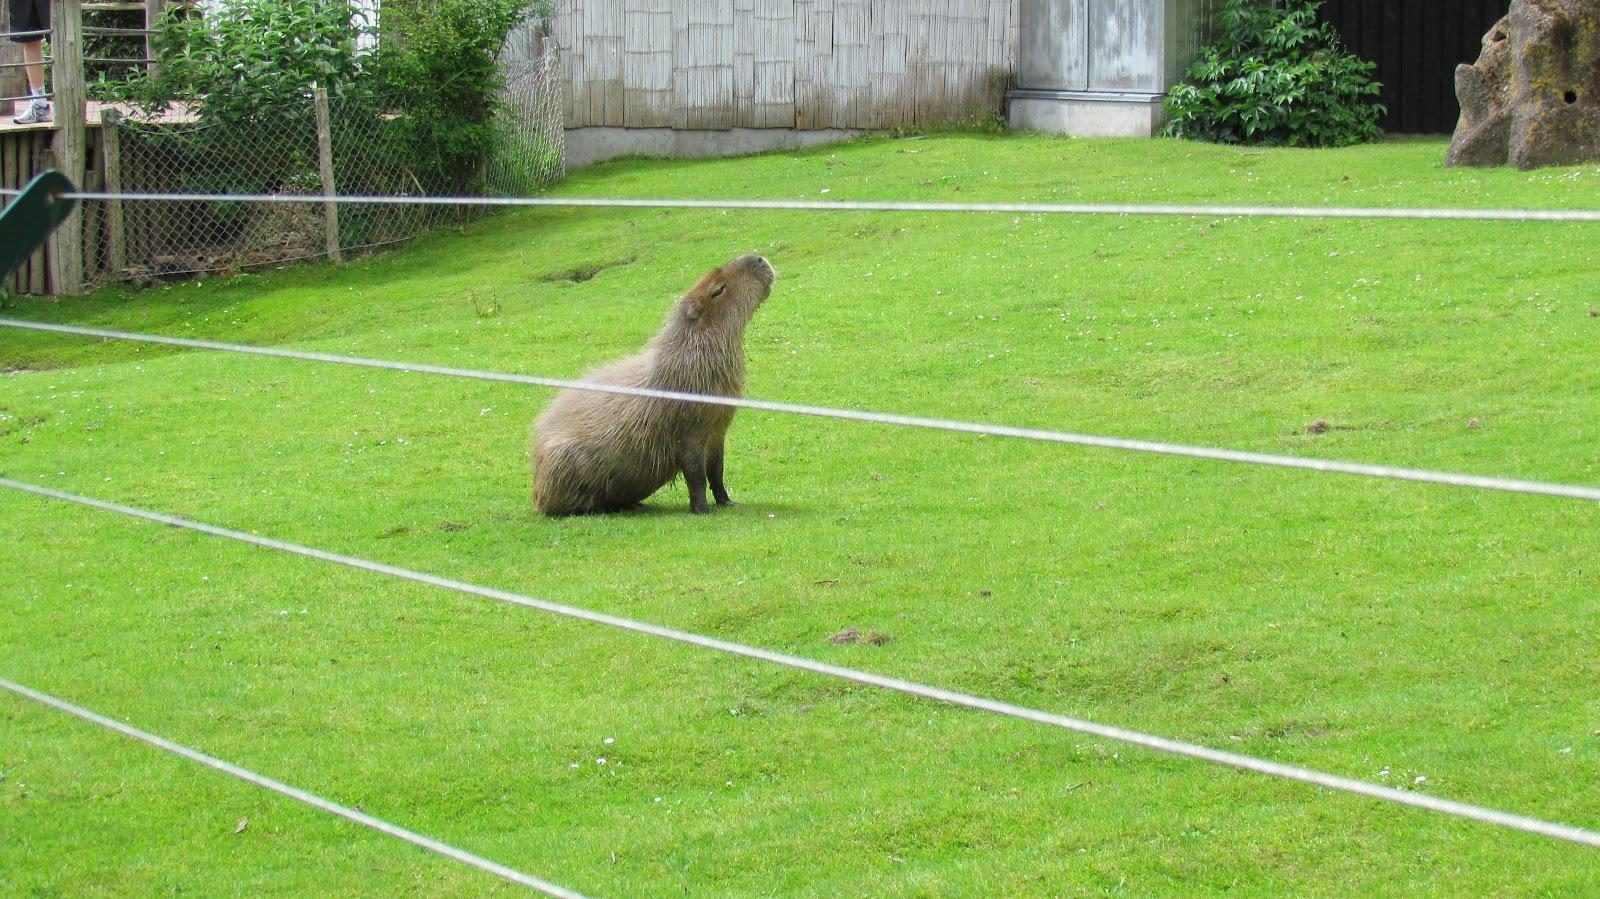 thai lille Istedgade Aalborg Zoo rabat